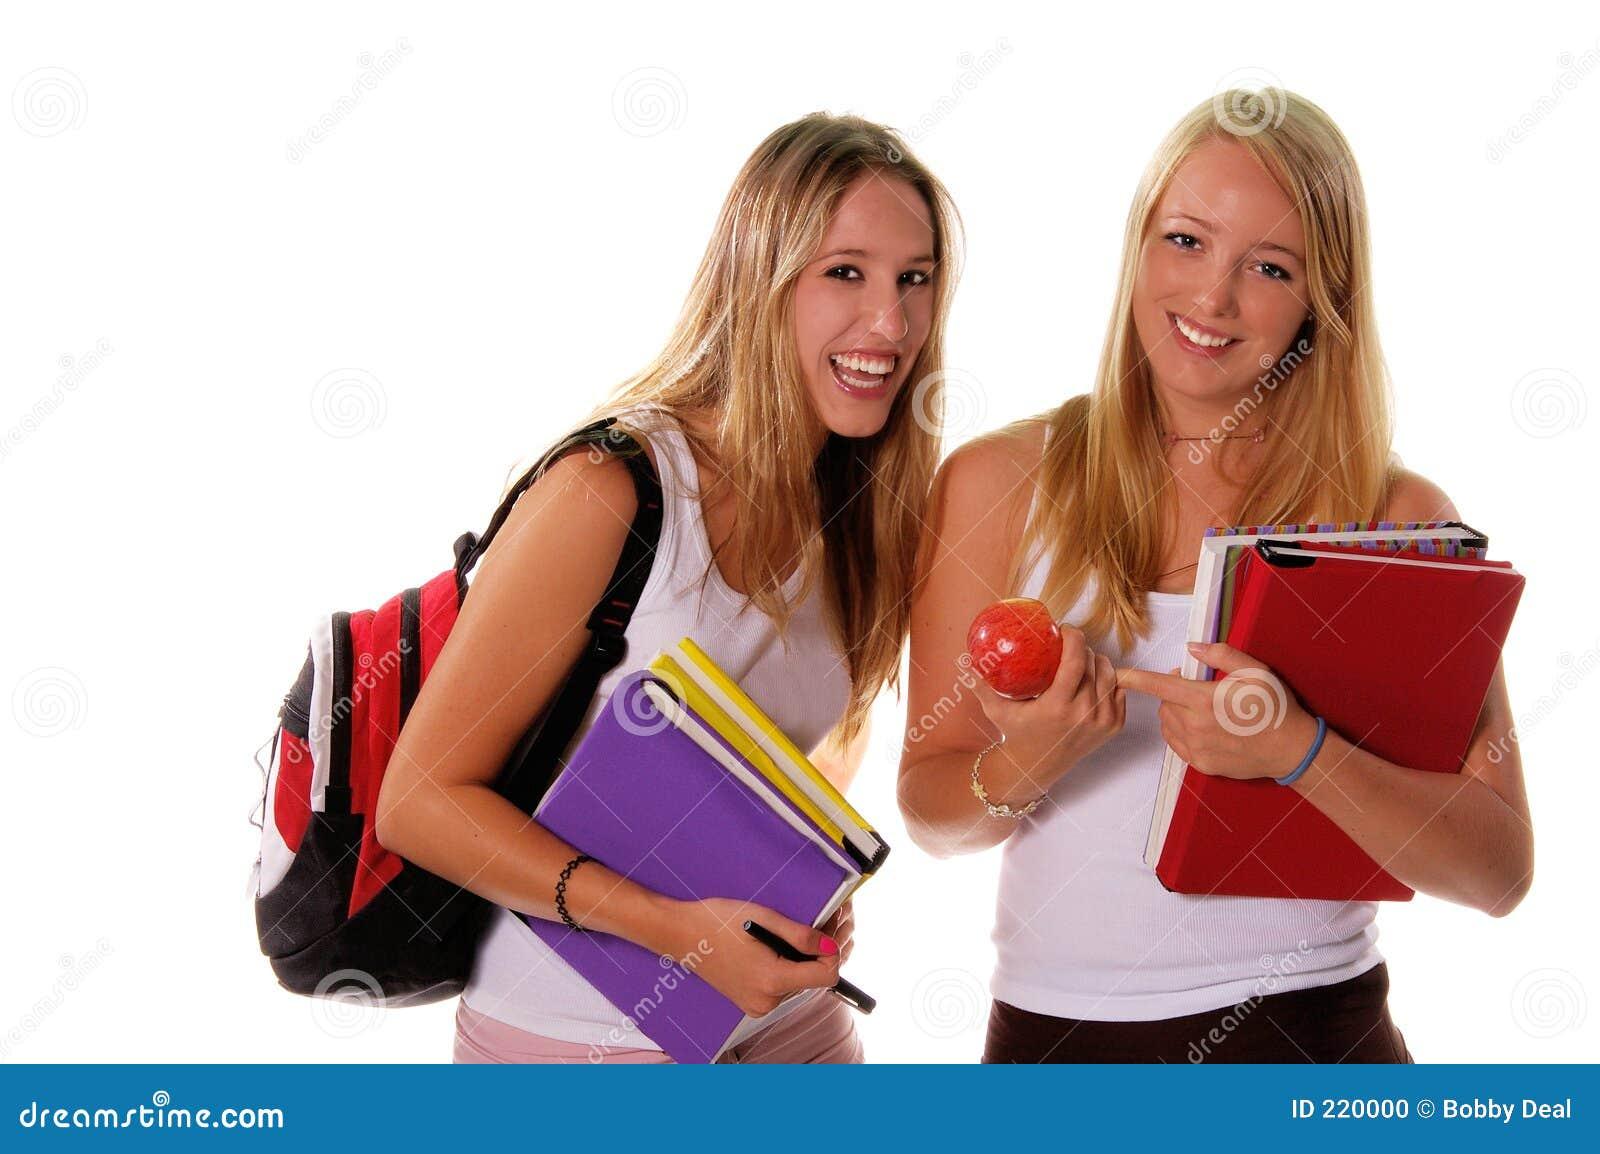 High School Senior Girls 3